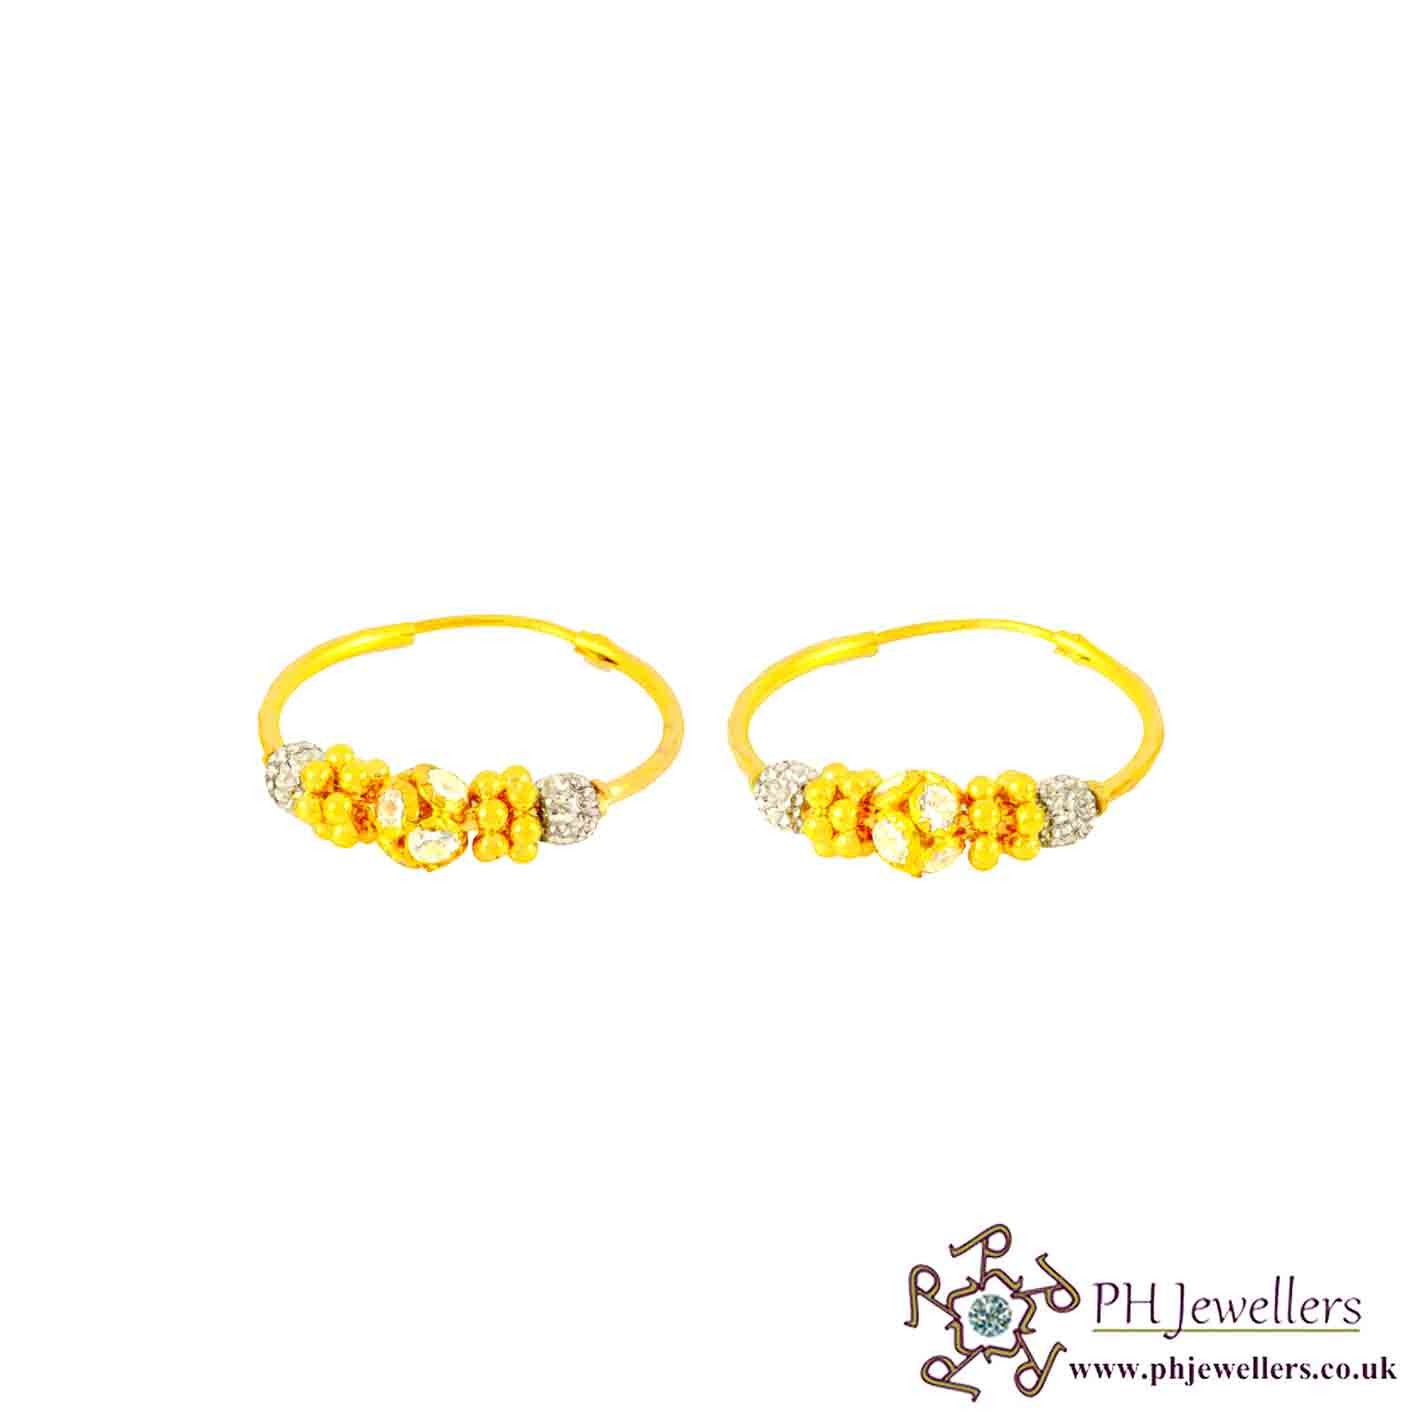 22 CT 916 Hallmark Yellow Gold Bali Earrings Rhodium CZ BE1